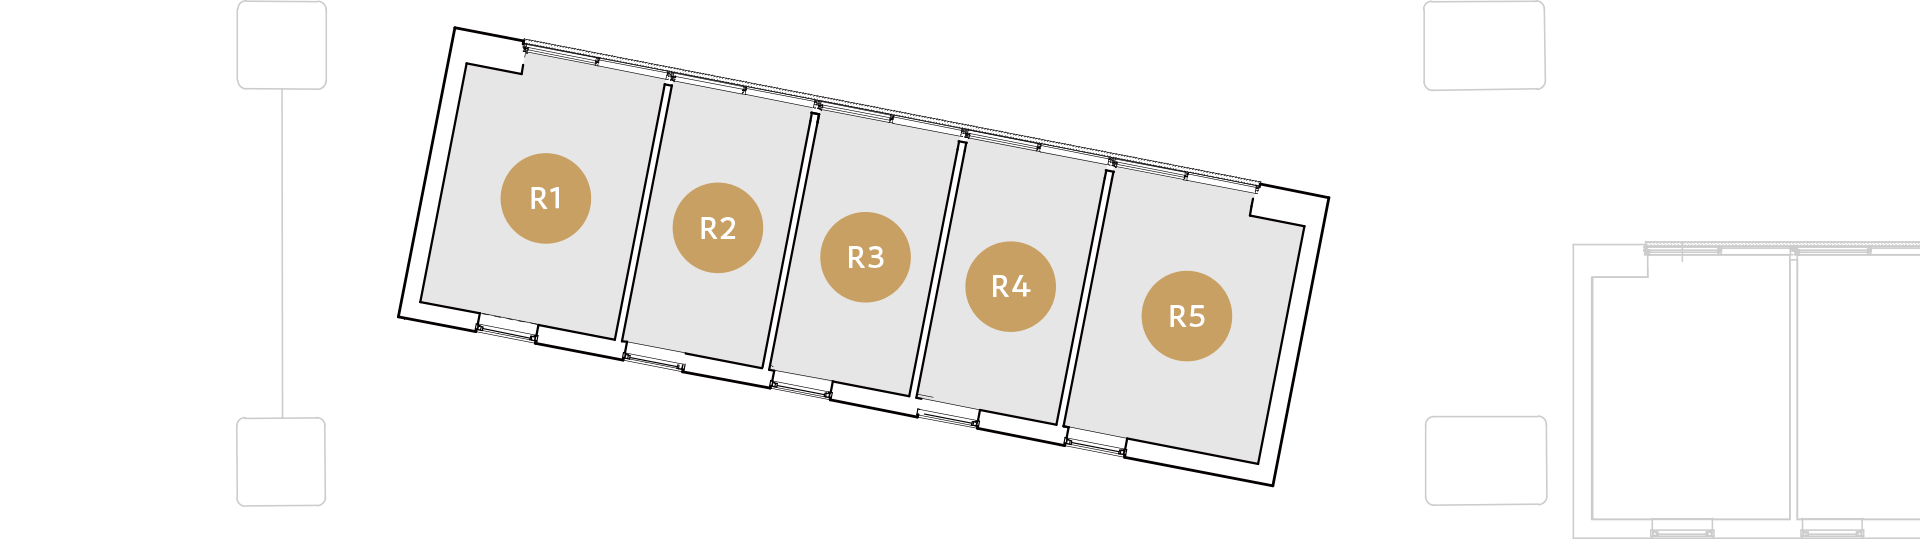 RESTAURANT(レストラン)施設マップ